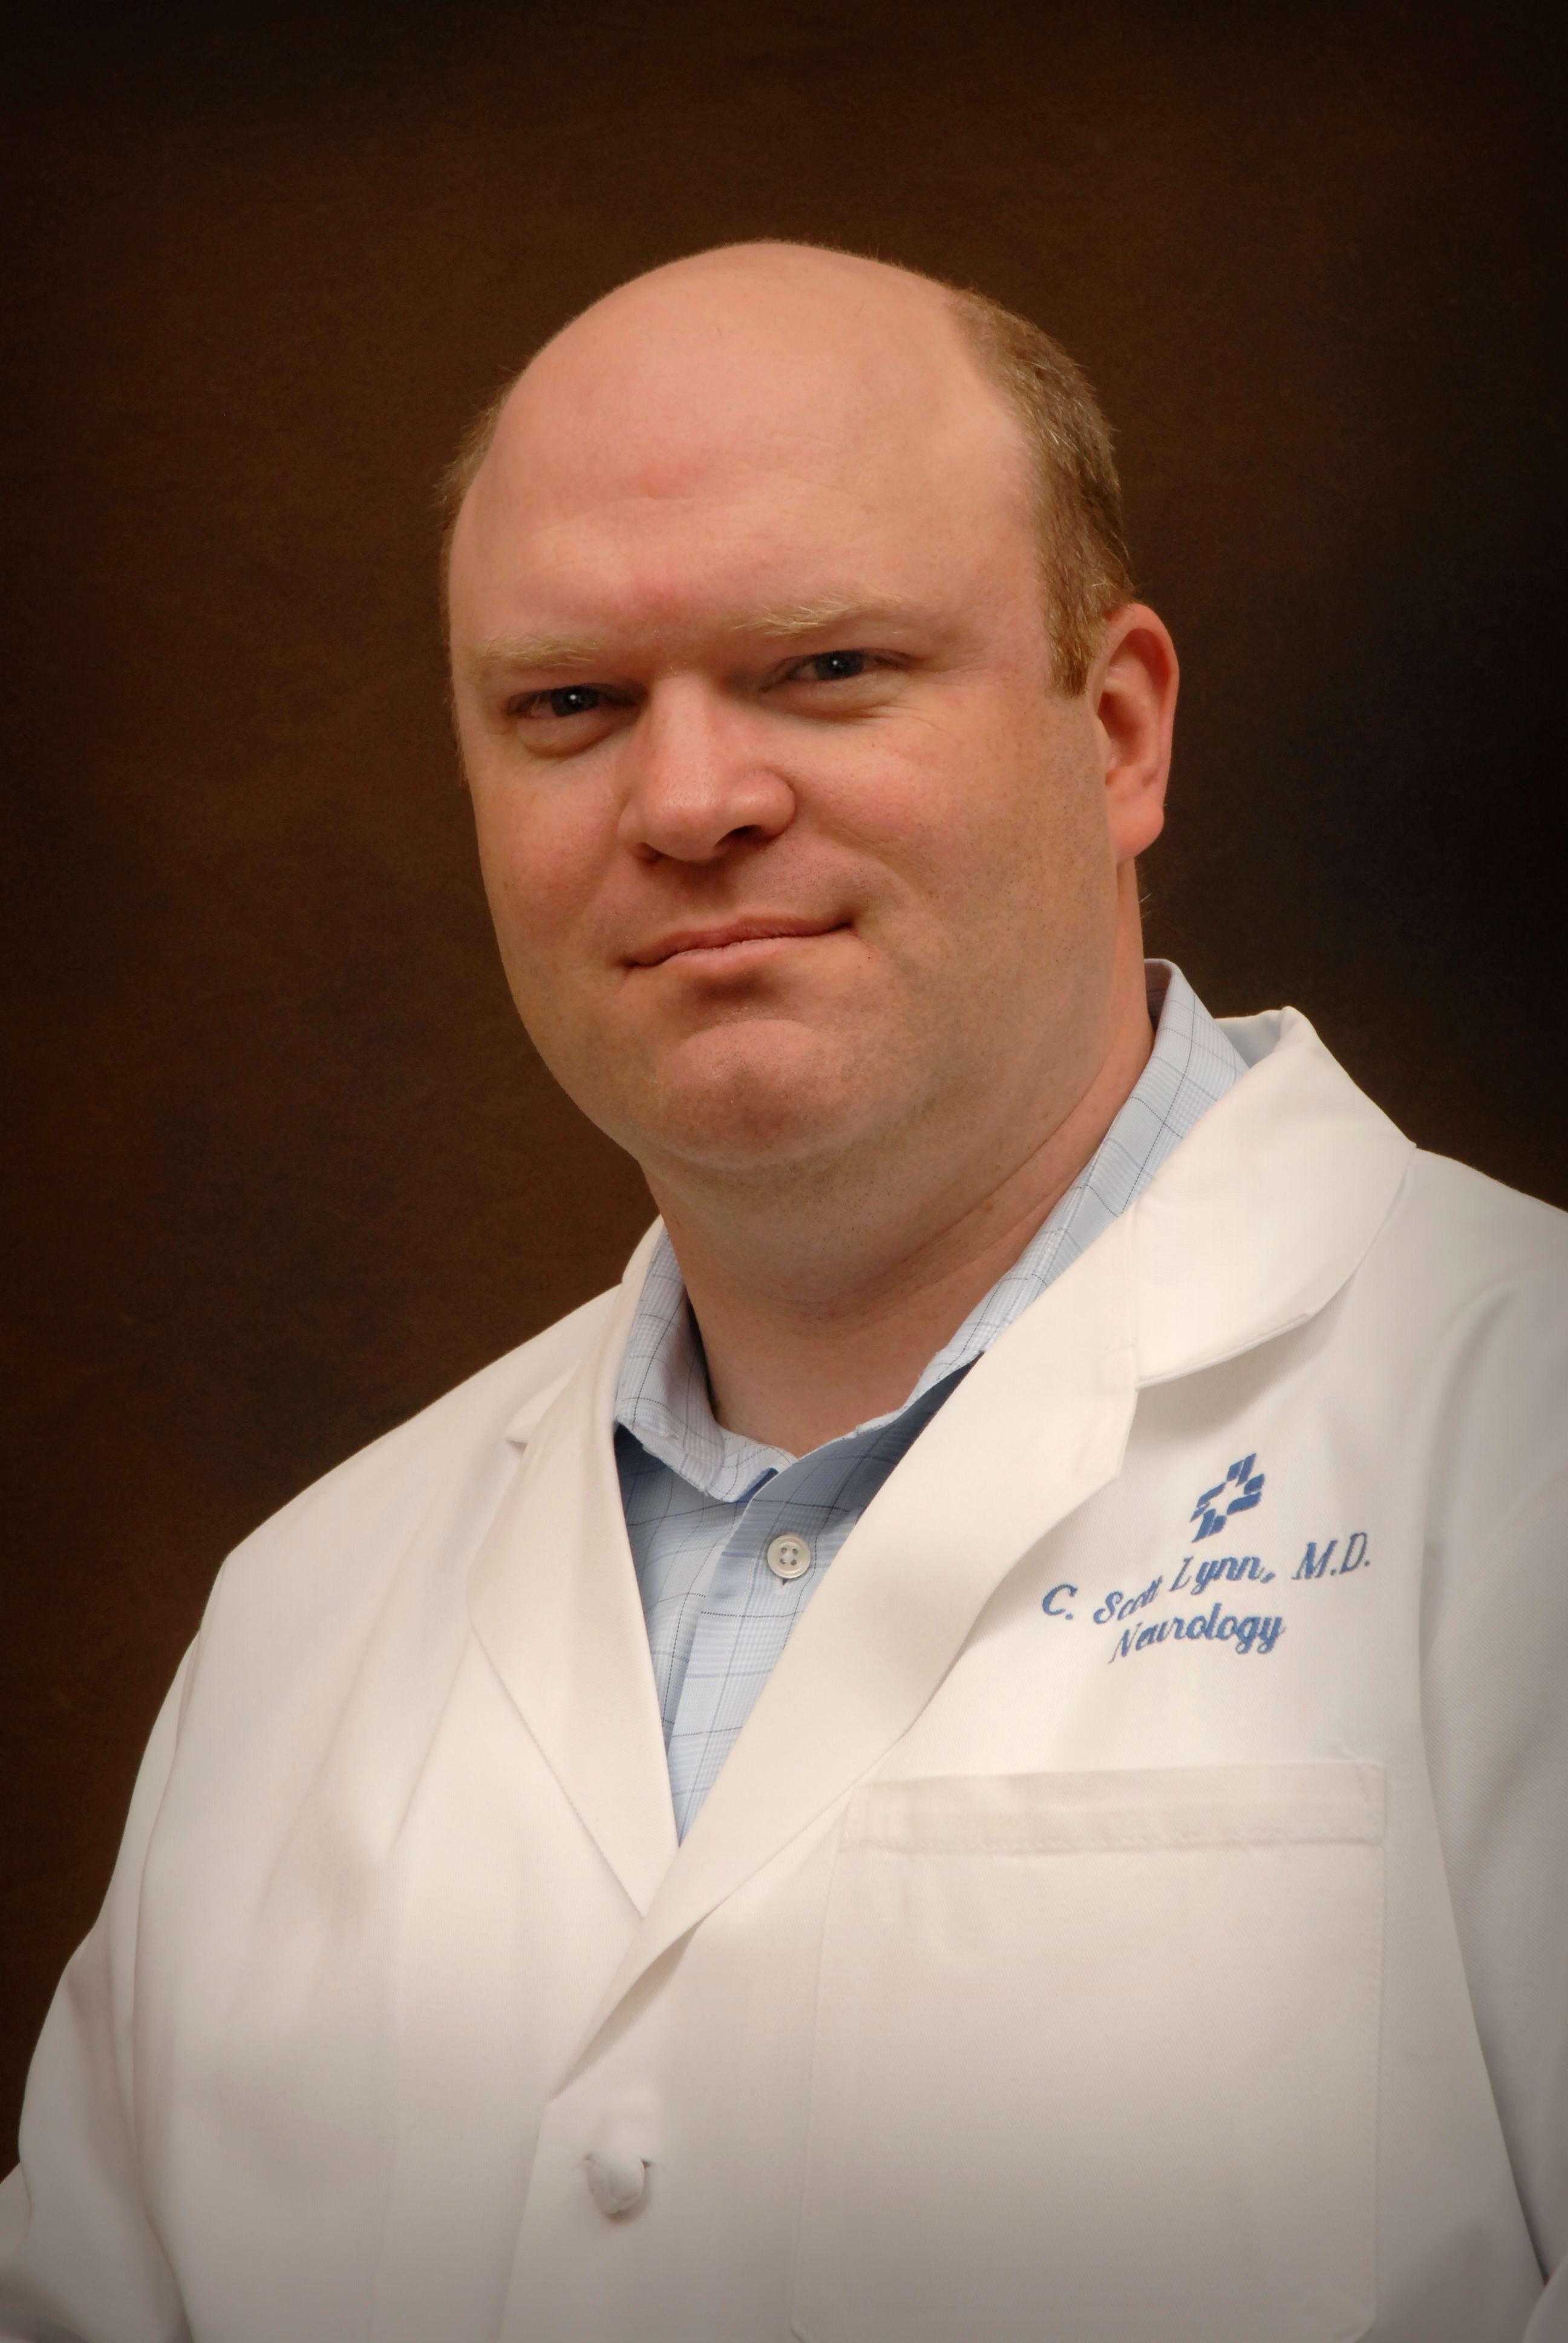 Dr. Christopher S Lynn MD